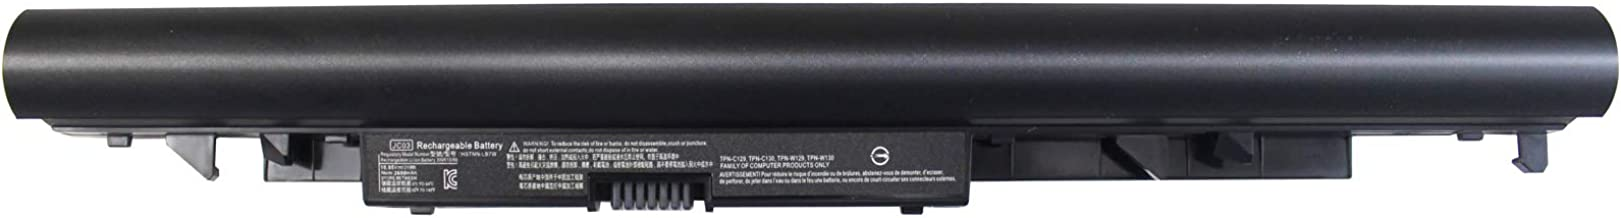 Shareway JC03 JC04 Repalcement Laptop Battery for HP 15-BS 15-BW 17-BS Series 919701-850 919700-850 HSTNN-DB8E HSTNN-HB7X HSTNN-DB8A HSTNN-DB8B PN-Q186 Q187 [10.95V 31Wh] - 12 Months Warranty!